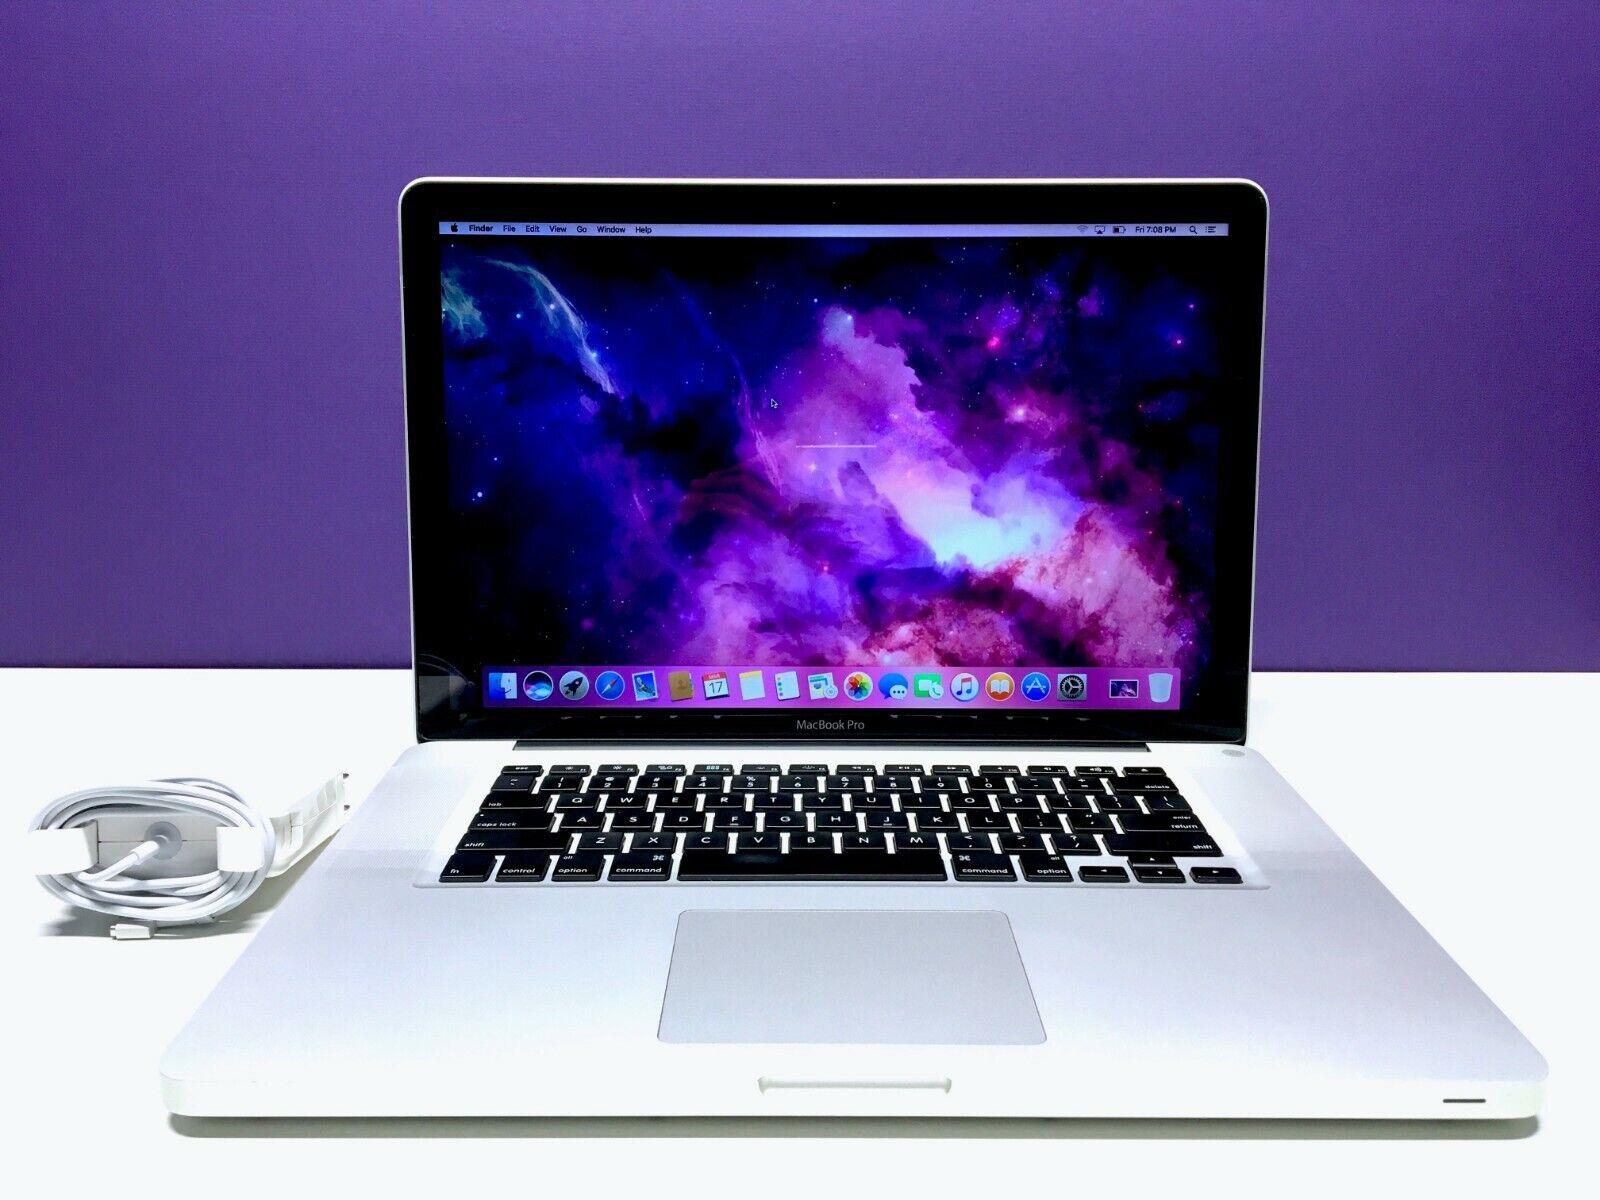 Apple MacBook Pro 15 Pre-Retina inch Laptop | QUAD CORE i7 | 16GB RAM | 1TB SSD!. Buy it now for 689.00